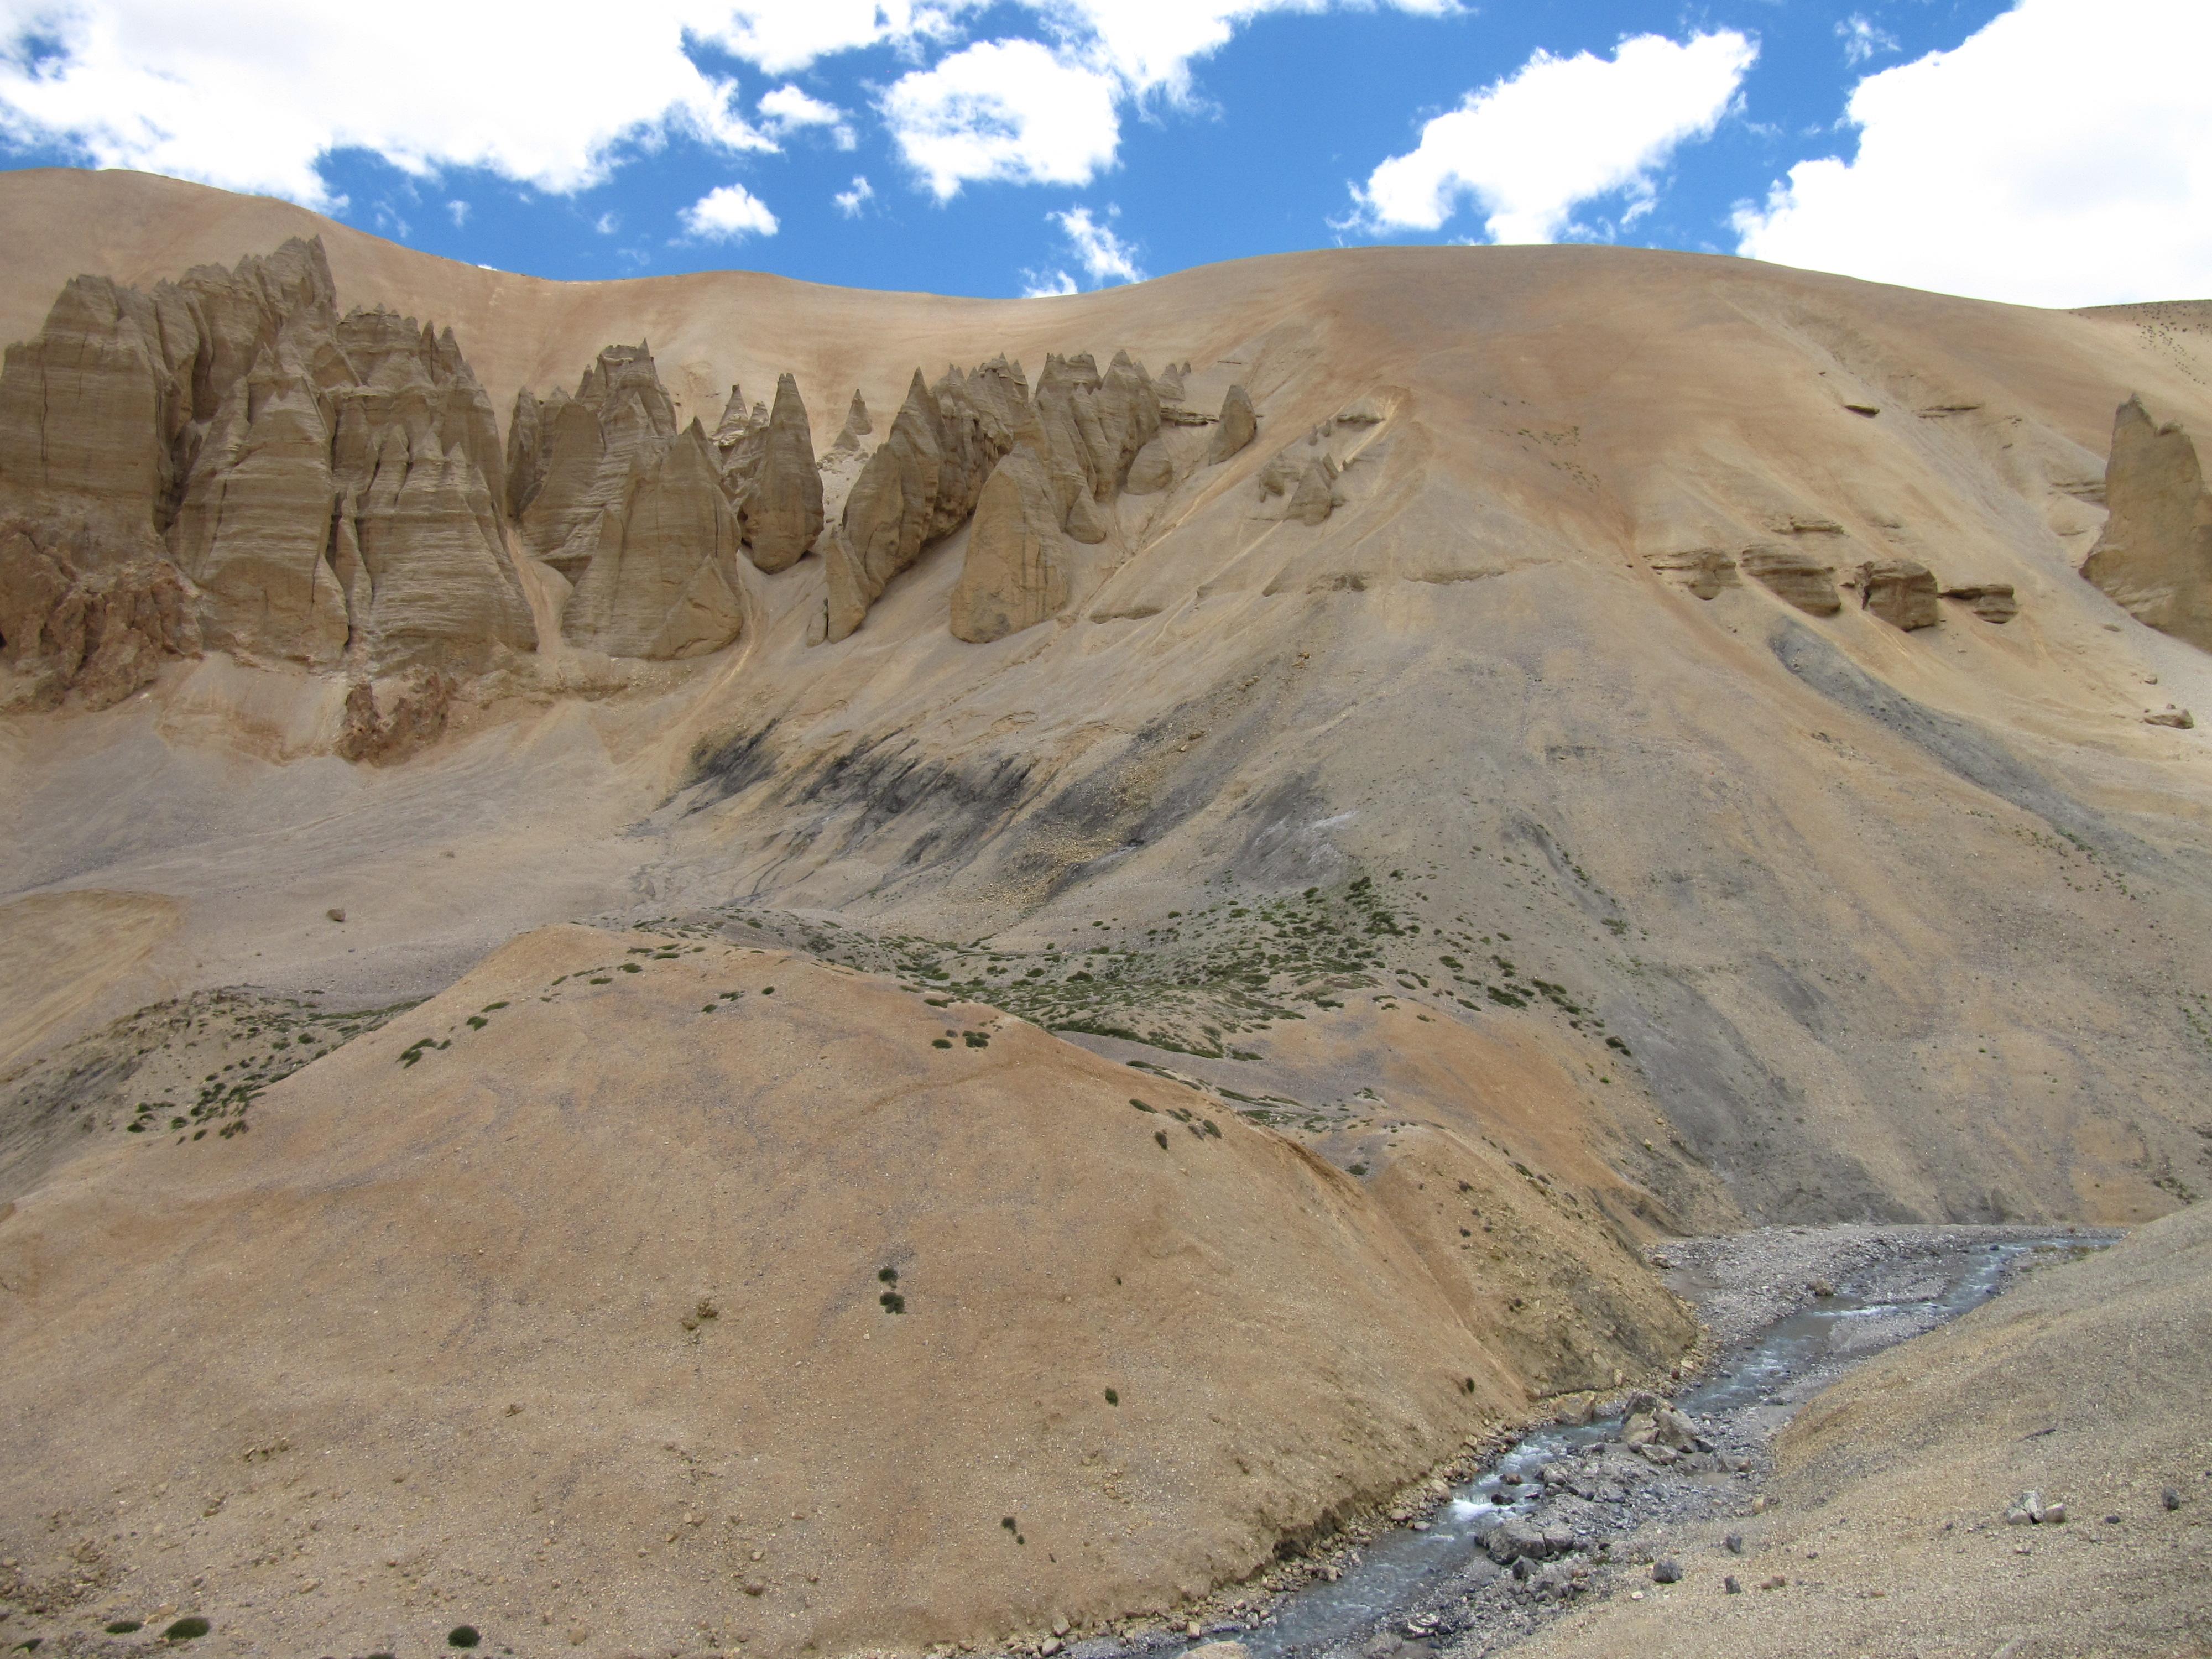 Paysage majestueux, route Manali-Leh, Inde, 4 juillet 2013